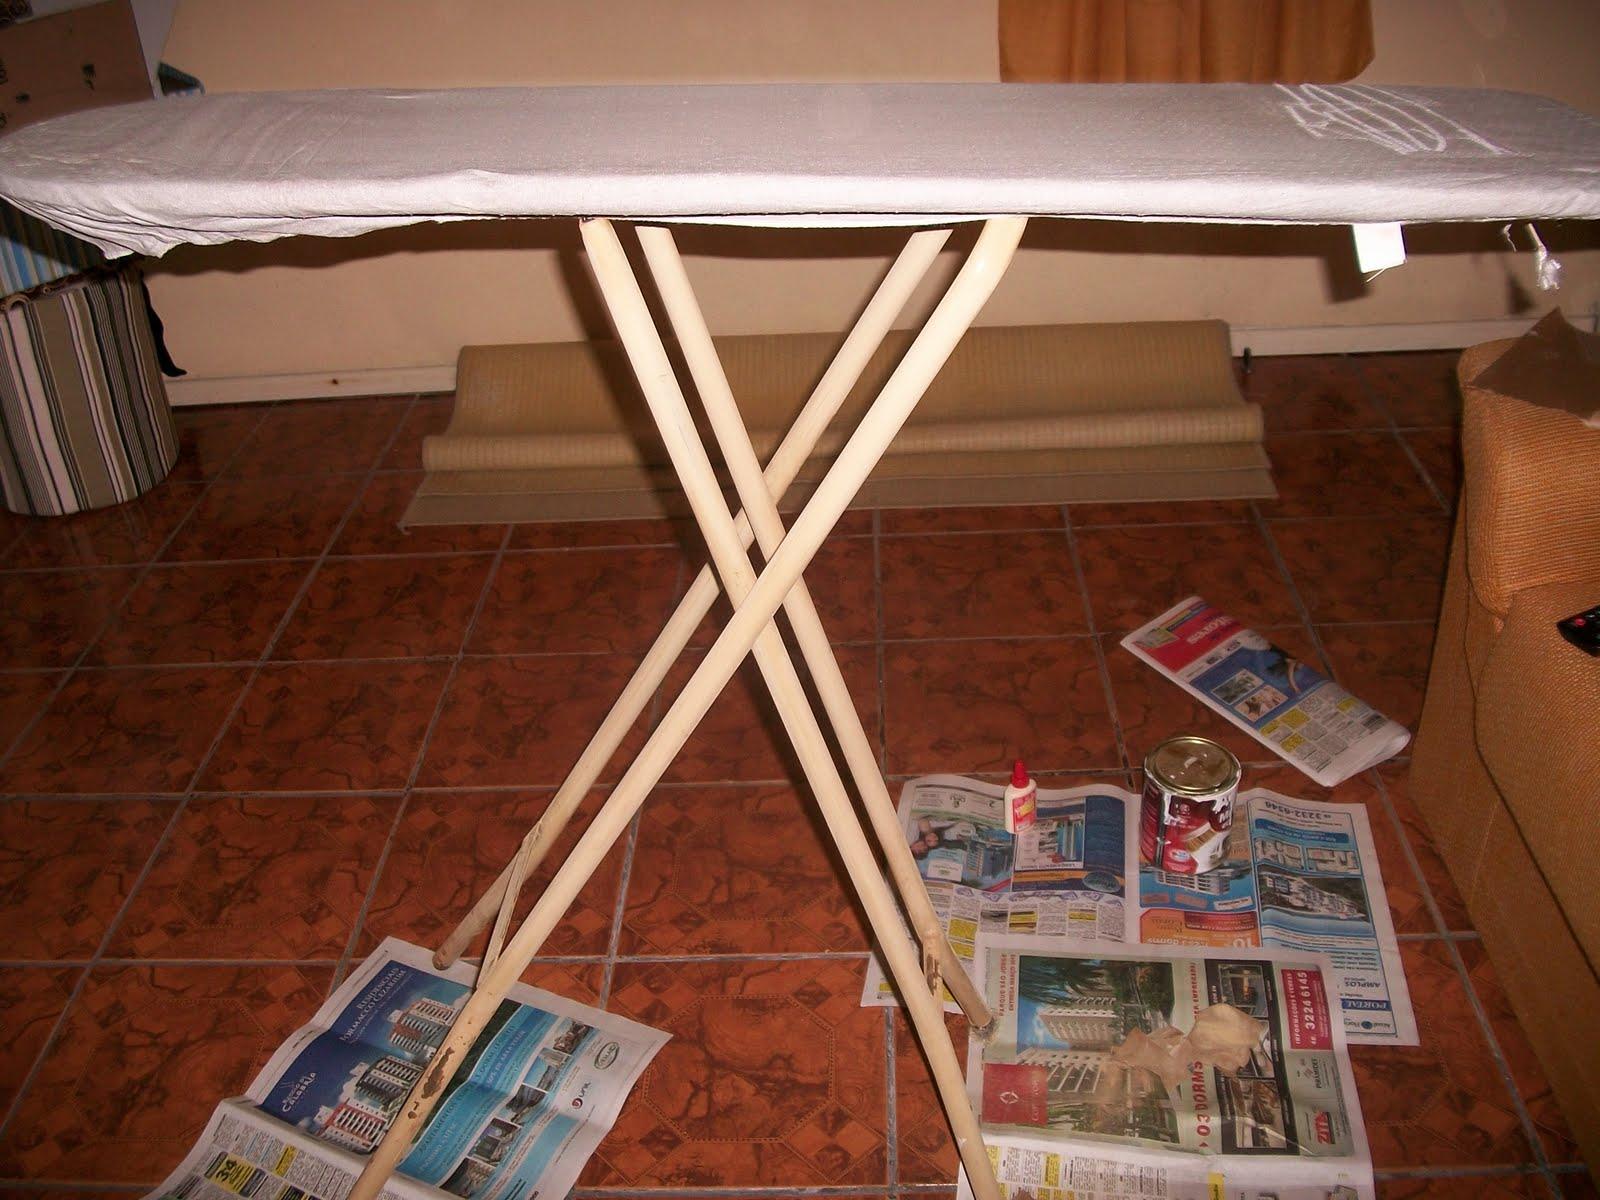 Reciclar reformar e decorar tabua de passar roupa for Como reciclar una mesa de tv vieja